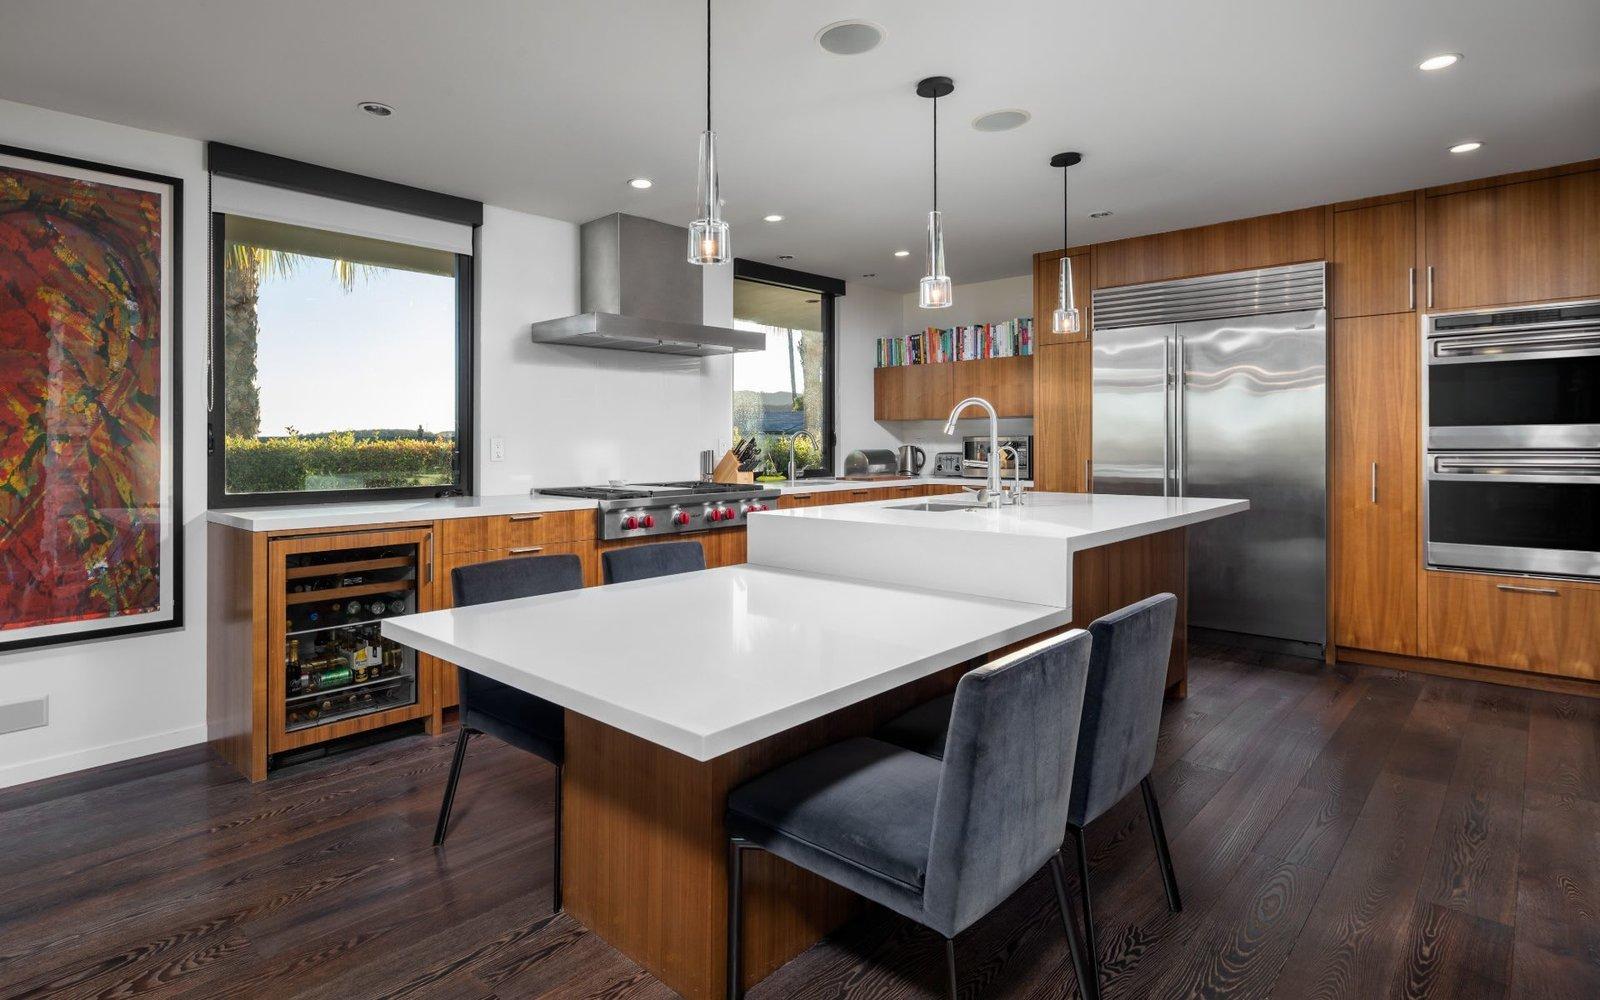 Elon Musk Midcentury Home kitchen